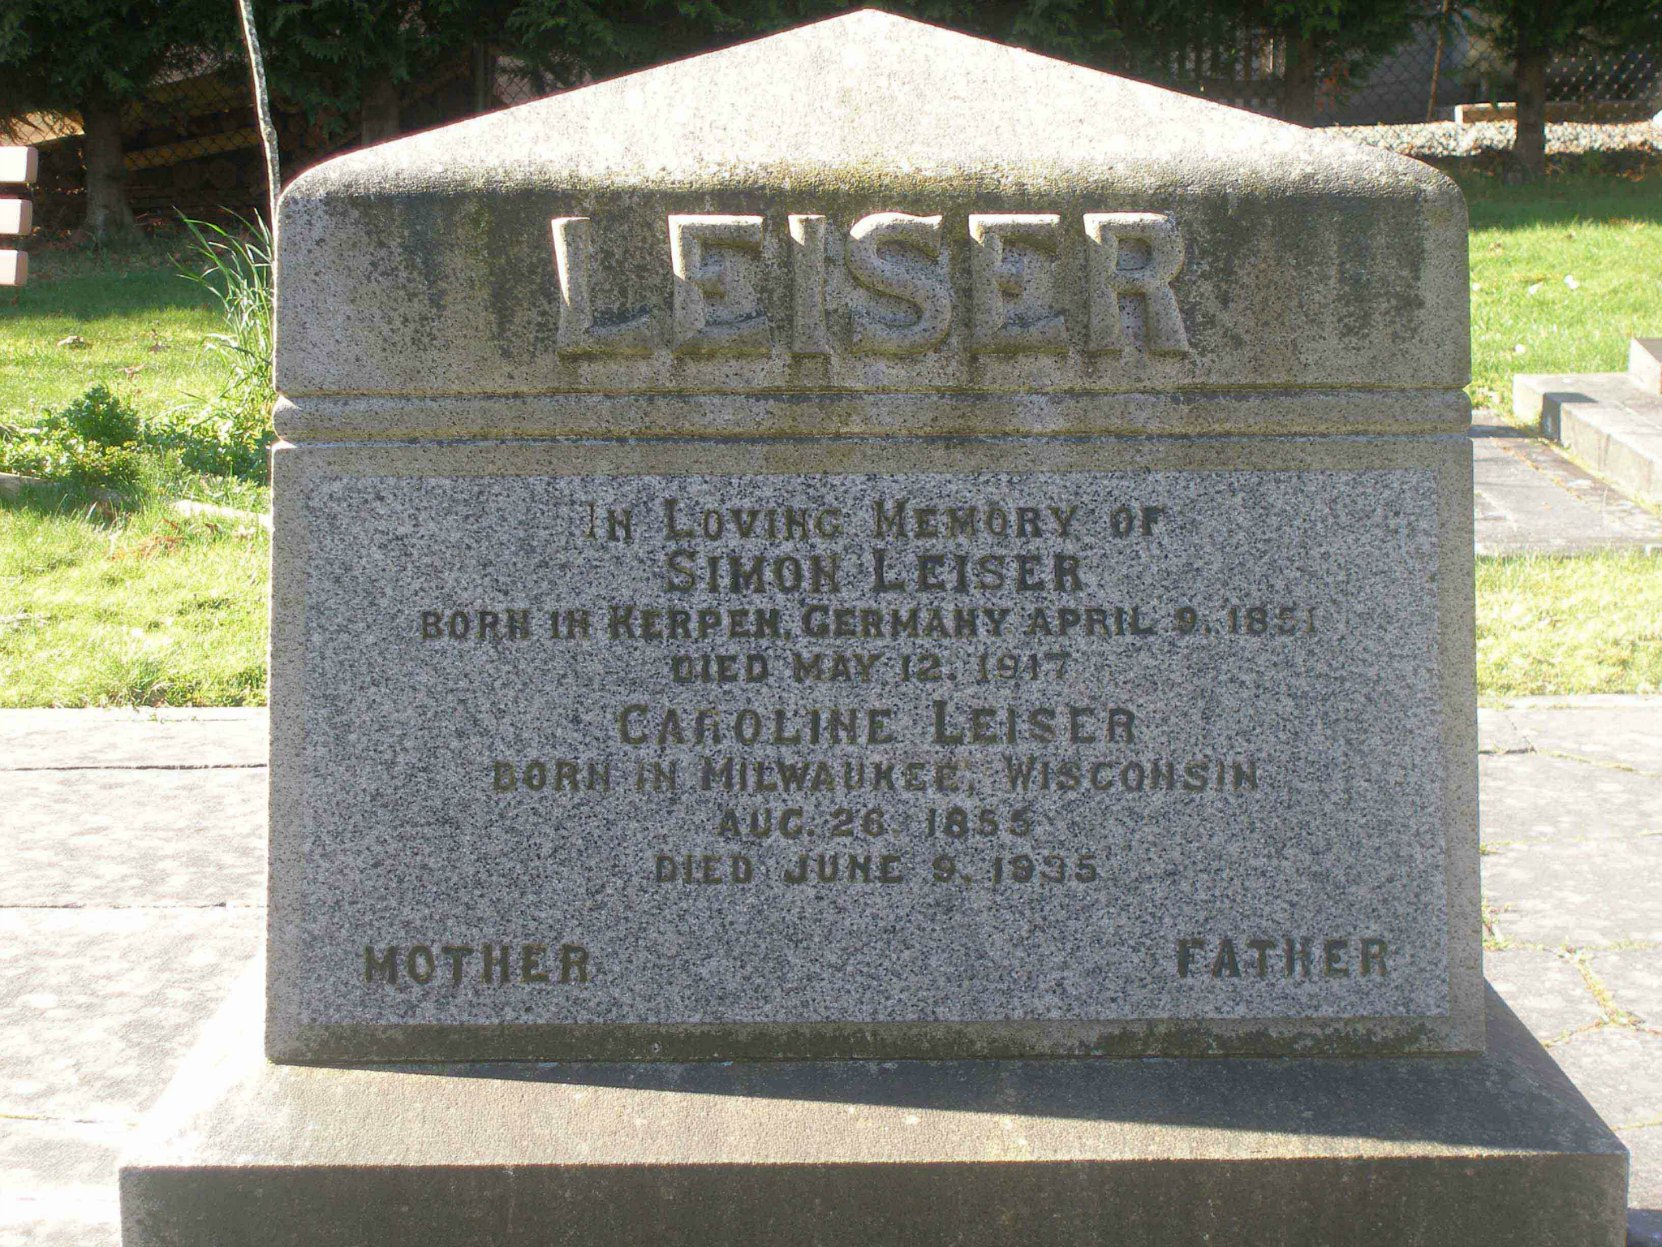 Simon Leiser's grave stone in Victoria Jewish Cemetery